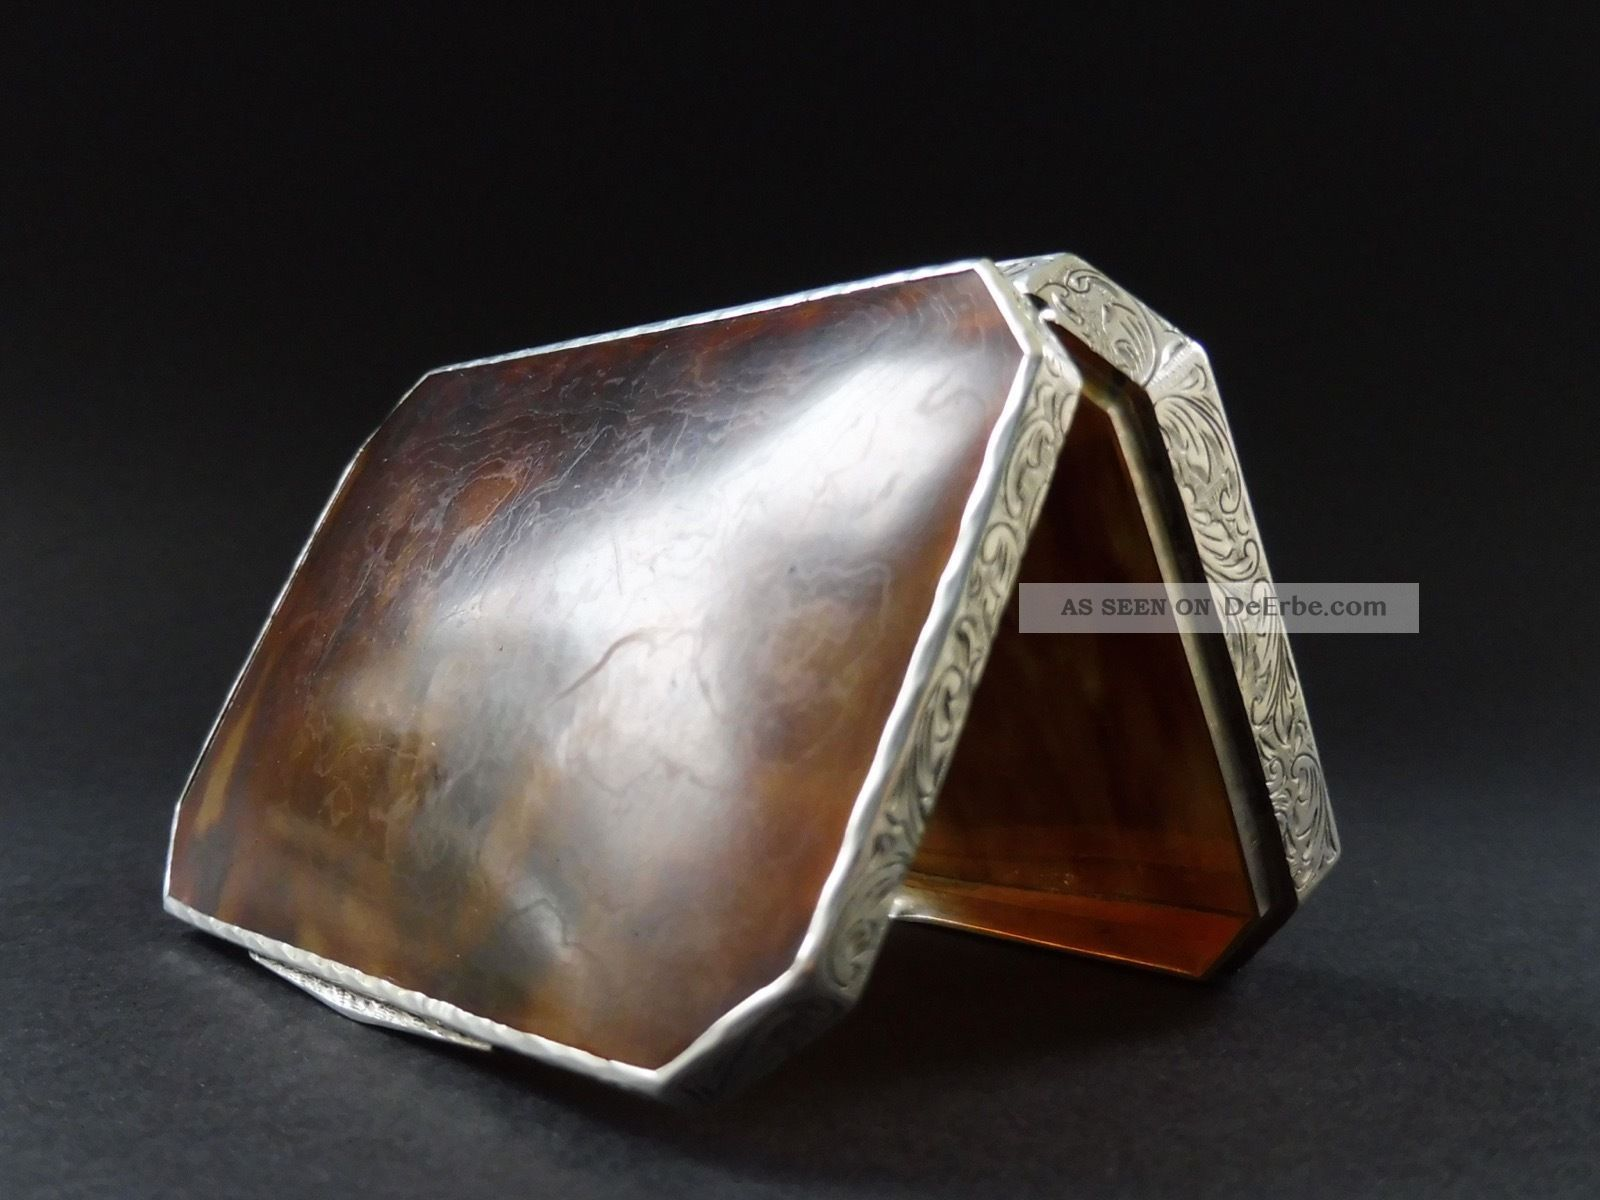 Jugendstil Schildpatt 935 Silber Dose Etui Art Nouveau Tortoise Shell Box Silver Objekte vor 1945 Bild